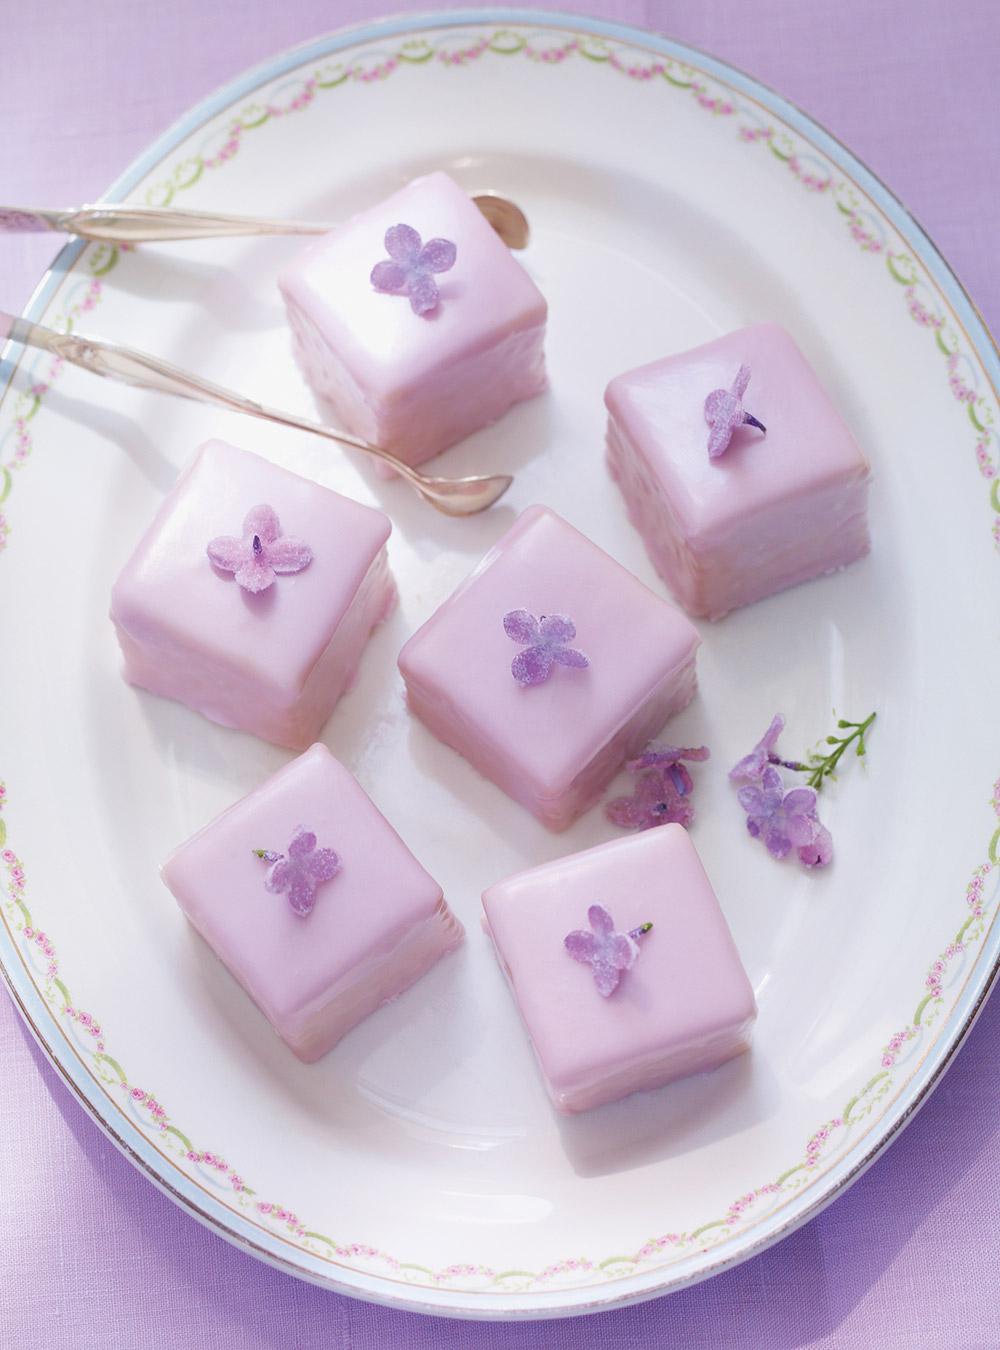 Petits fours au lilas cristallisé | ricardo